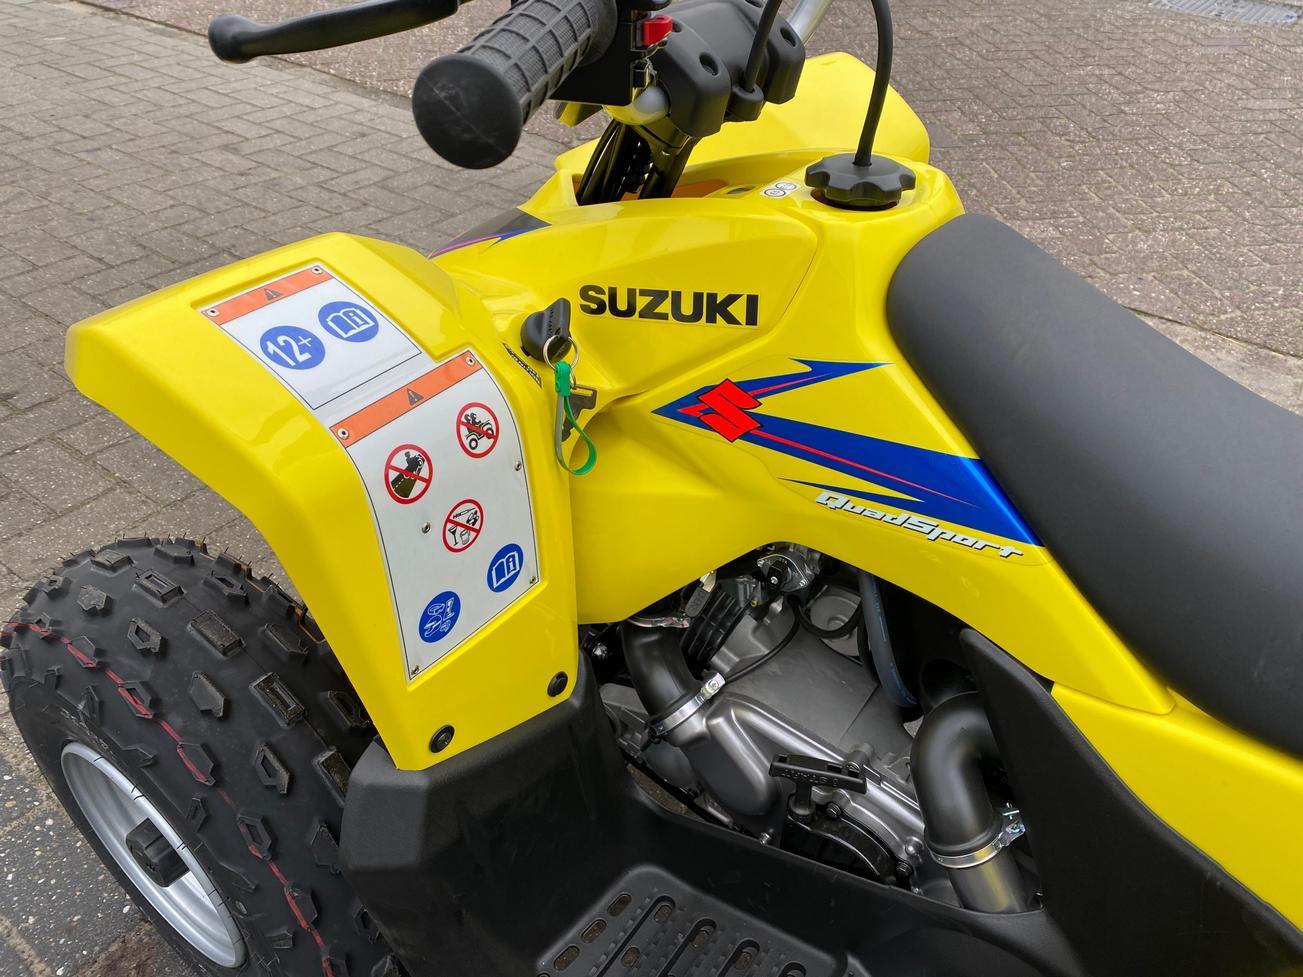 SUZUKI LT-Z90 Quadsport